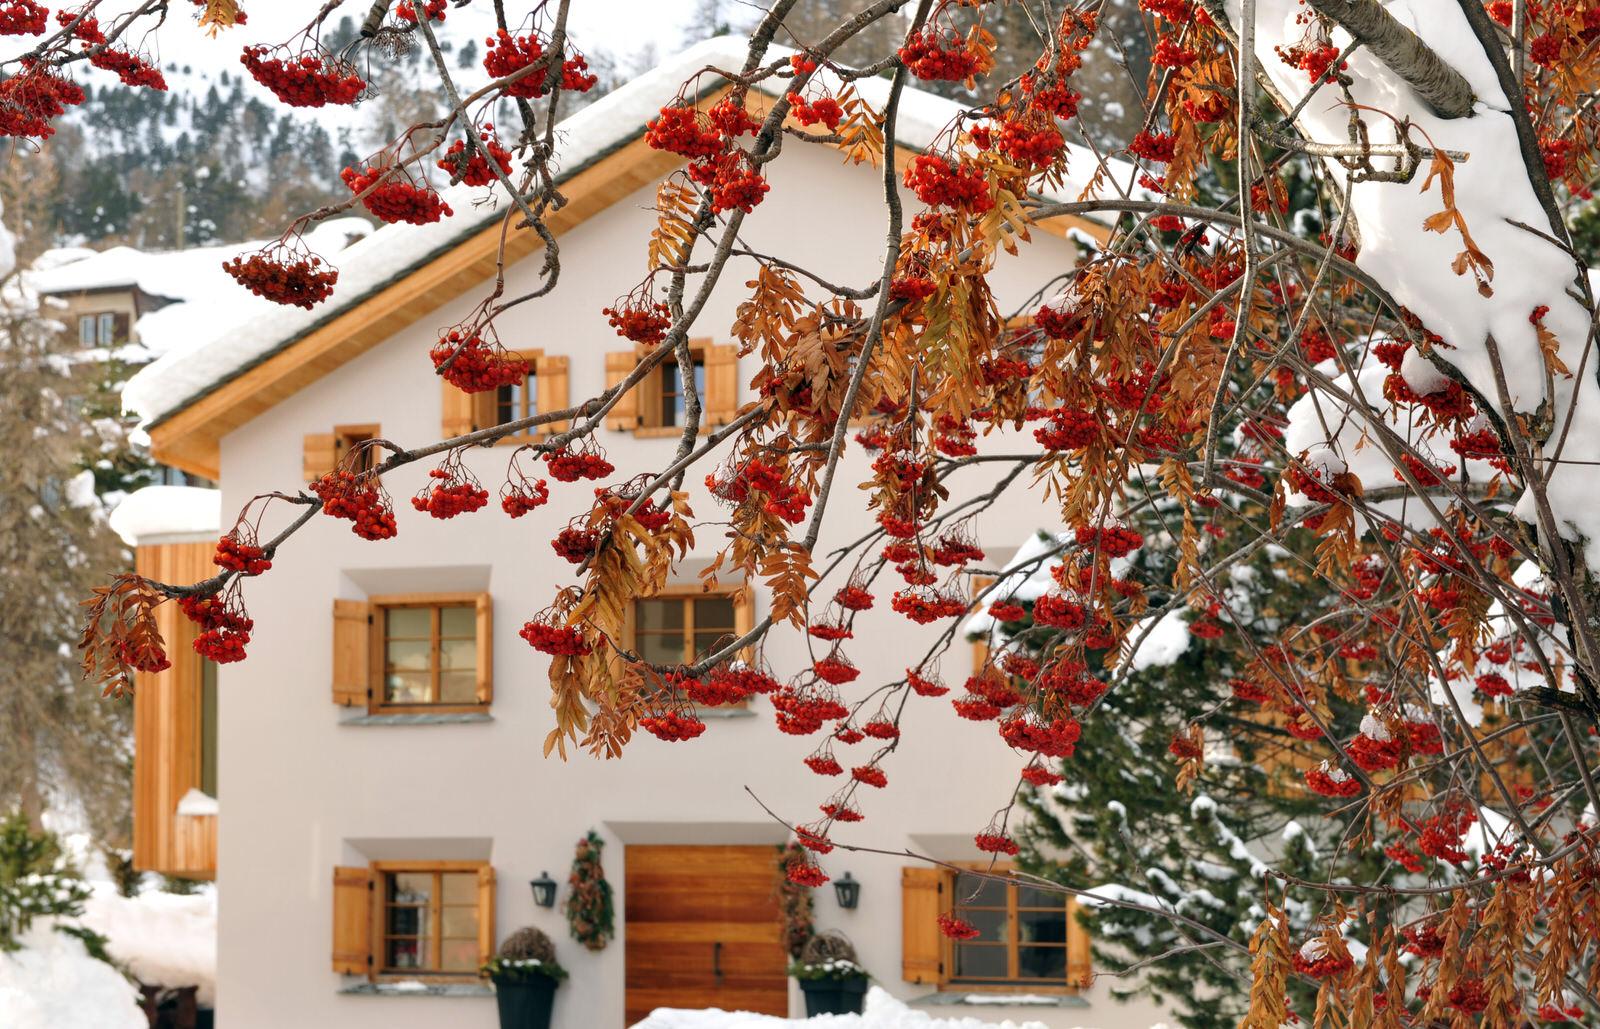 chesetta exterior with berrie.jpg